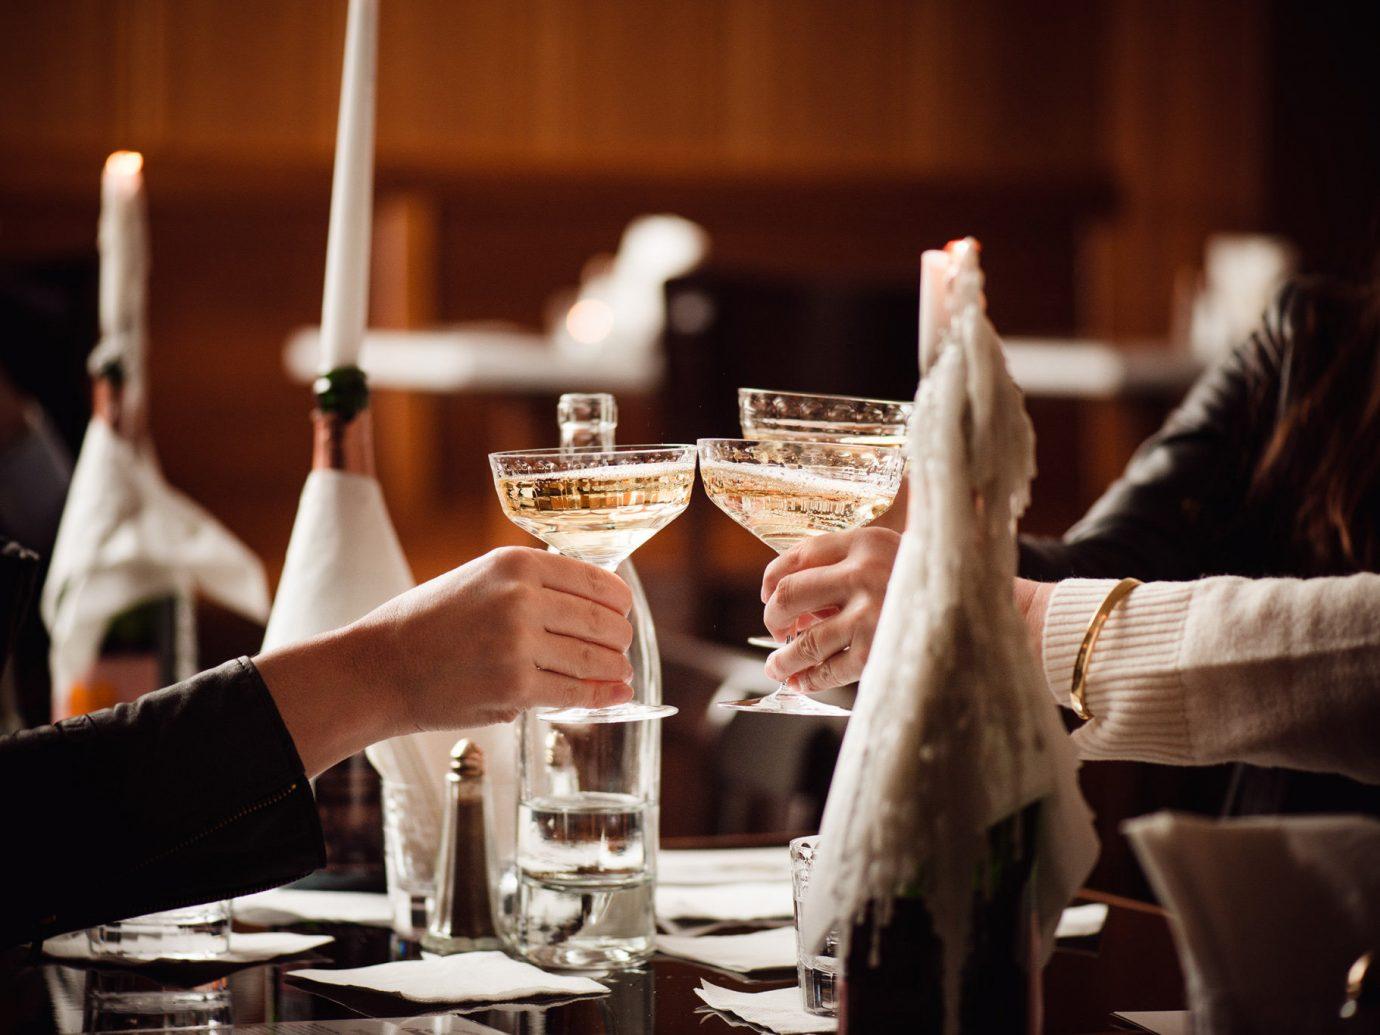 Boutique Hotels Romance Trip Ideas Winter table person indoor restaurant dinner meal rehearsal dinner sense Bar Drink